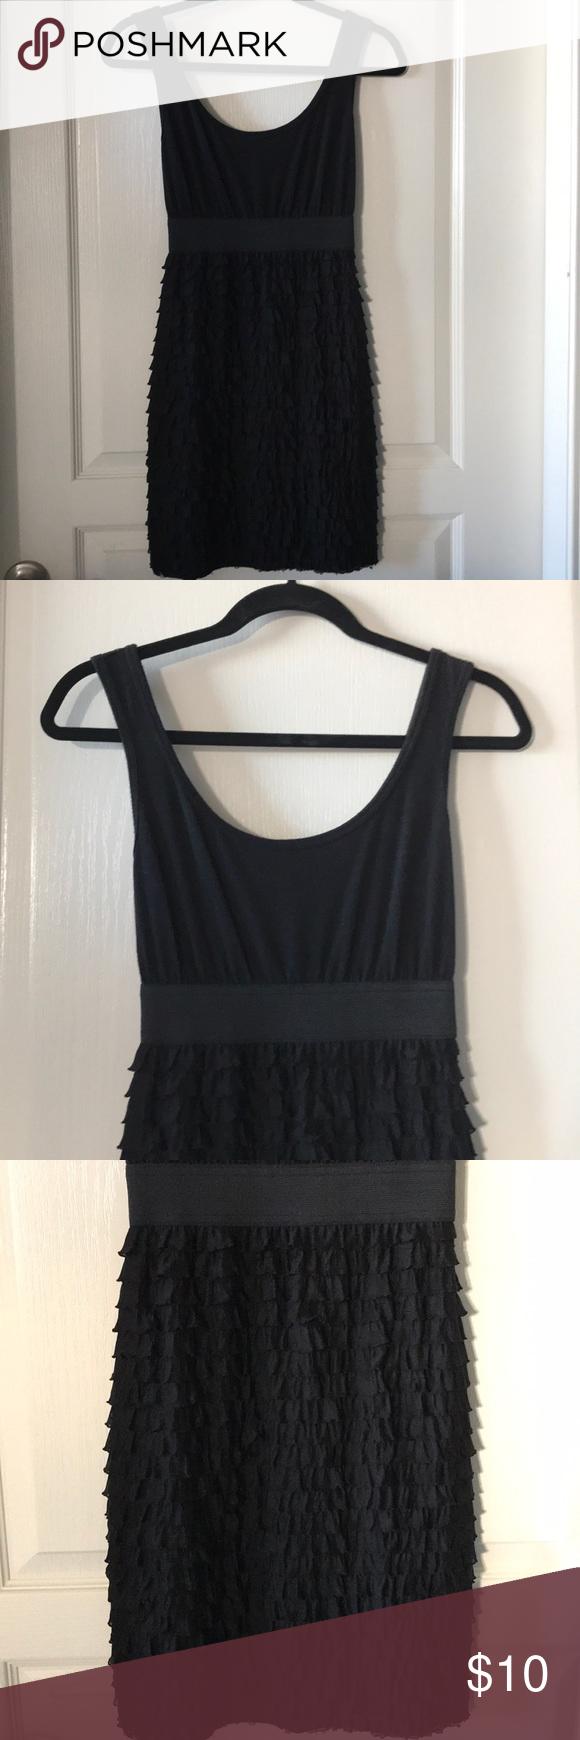 Xhilaration Black Ruffle Dress Target Brand Xhilaration Black Tank Dress With Elastic Waistline And Ruffle Bo Black Ruffle Dress Black Tank Dress Black Ruffle [ 1740 x 580 Pixel ]